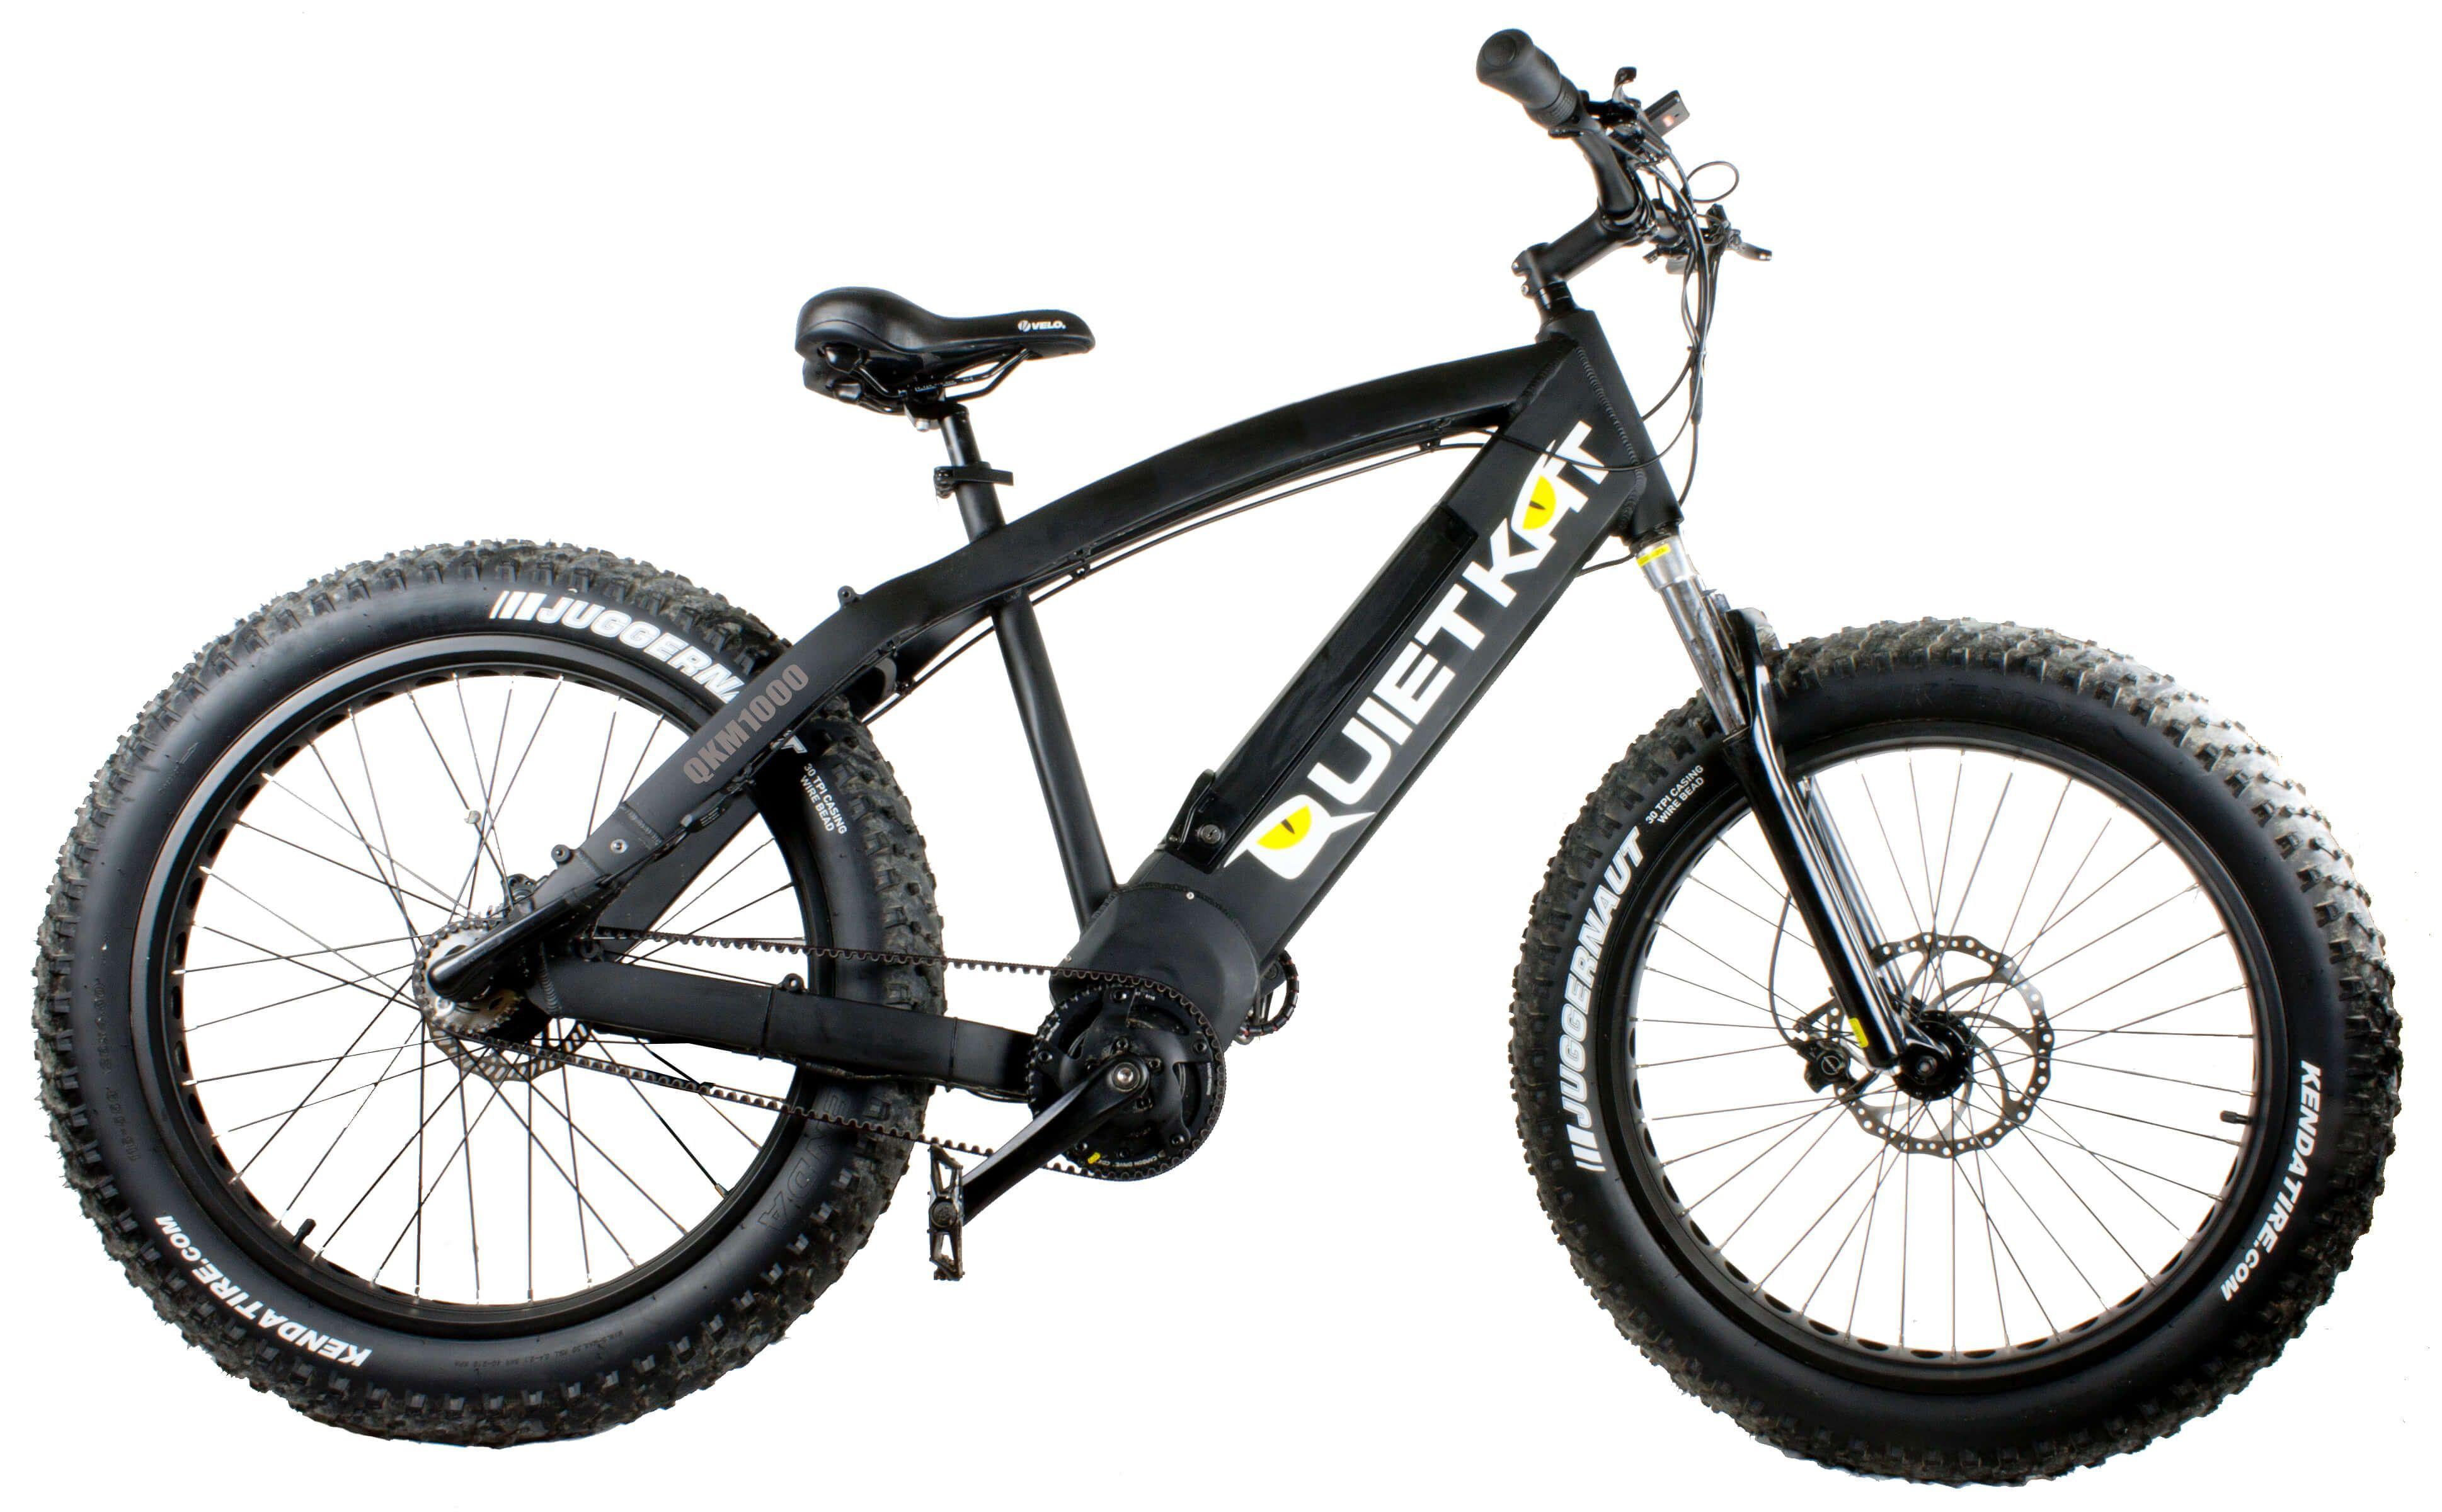 Quietkat Fatkat 48v 1000w Internal Motor Carbon Belt Drive Electric Mountain Bike Black With Images Leisure Bike Lightweight Bike Bike